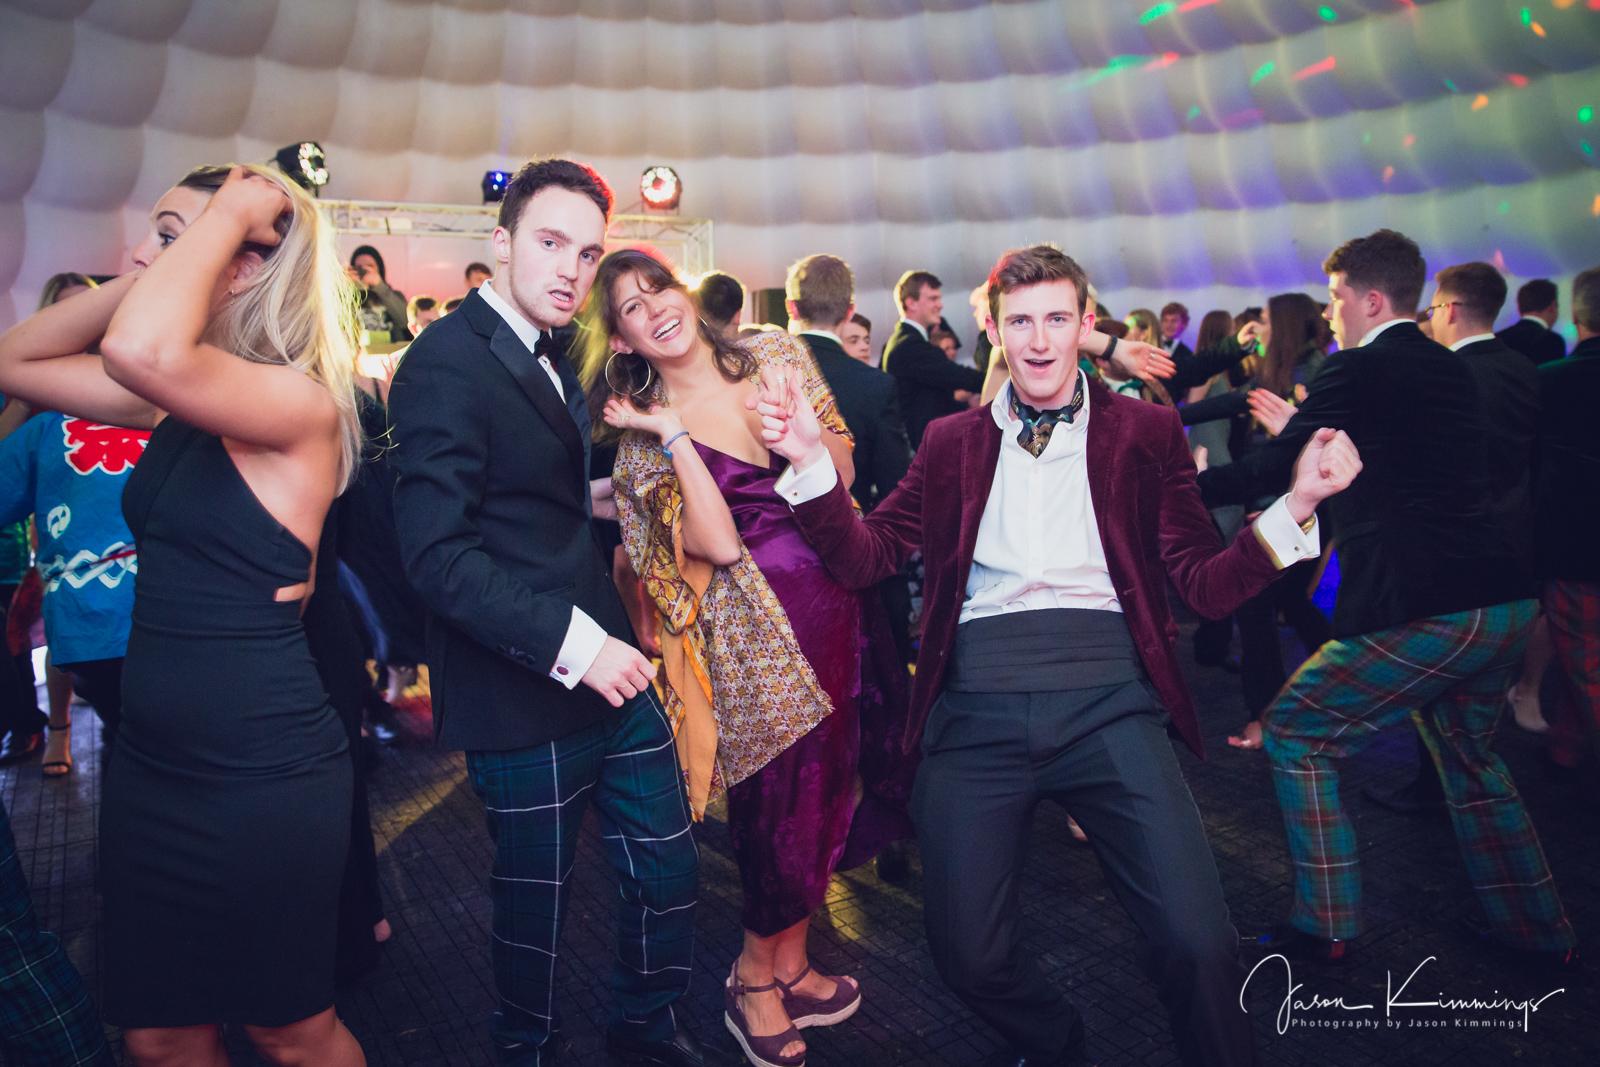 Party-event-photography-west-lothian-edinburgh-glasgow-22.jpg